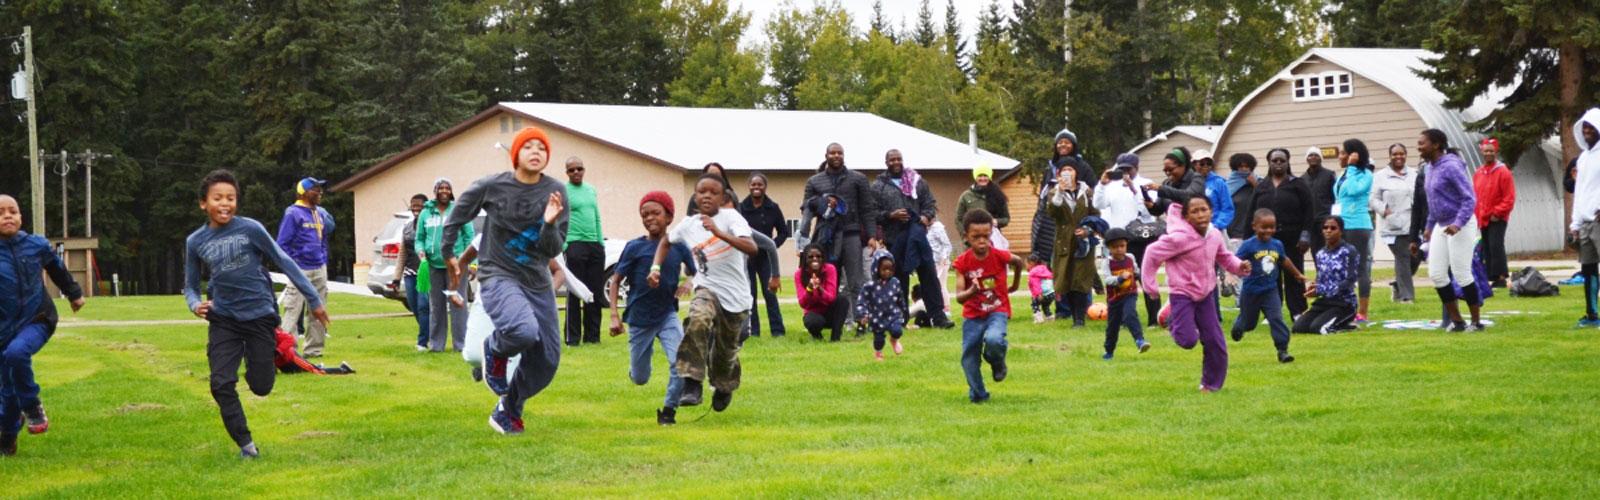 CAAA Annual Family Retreat